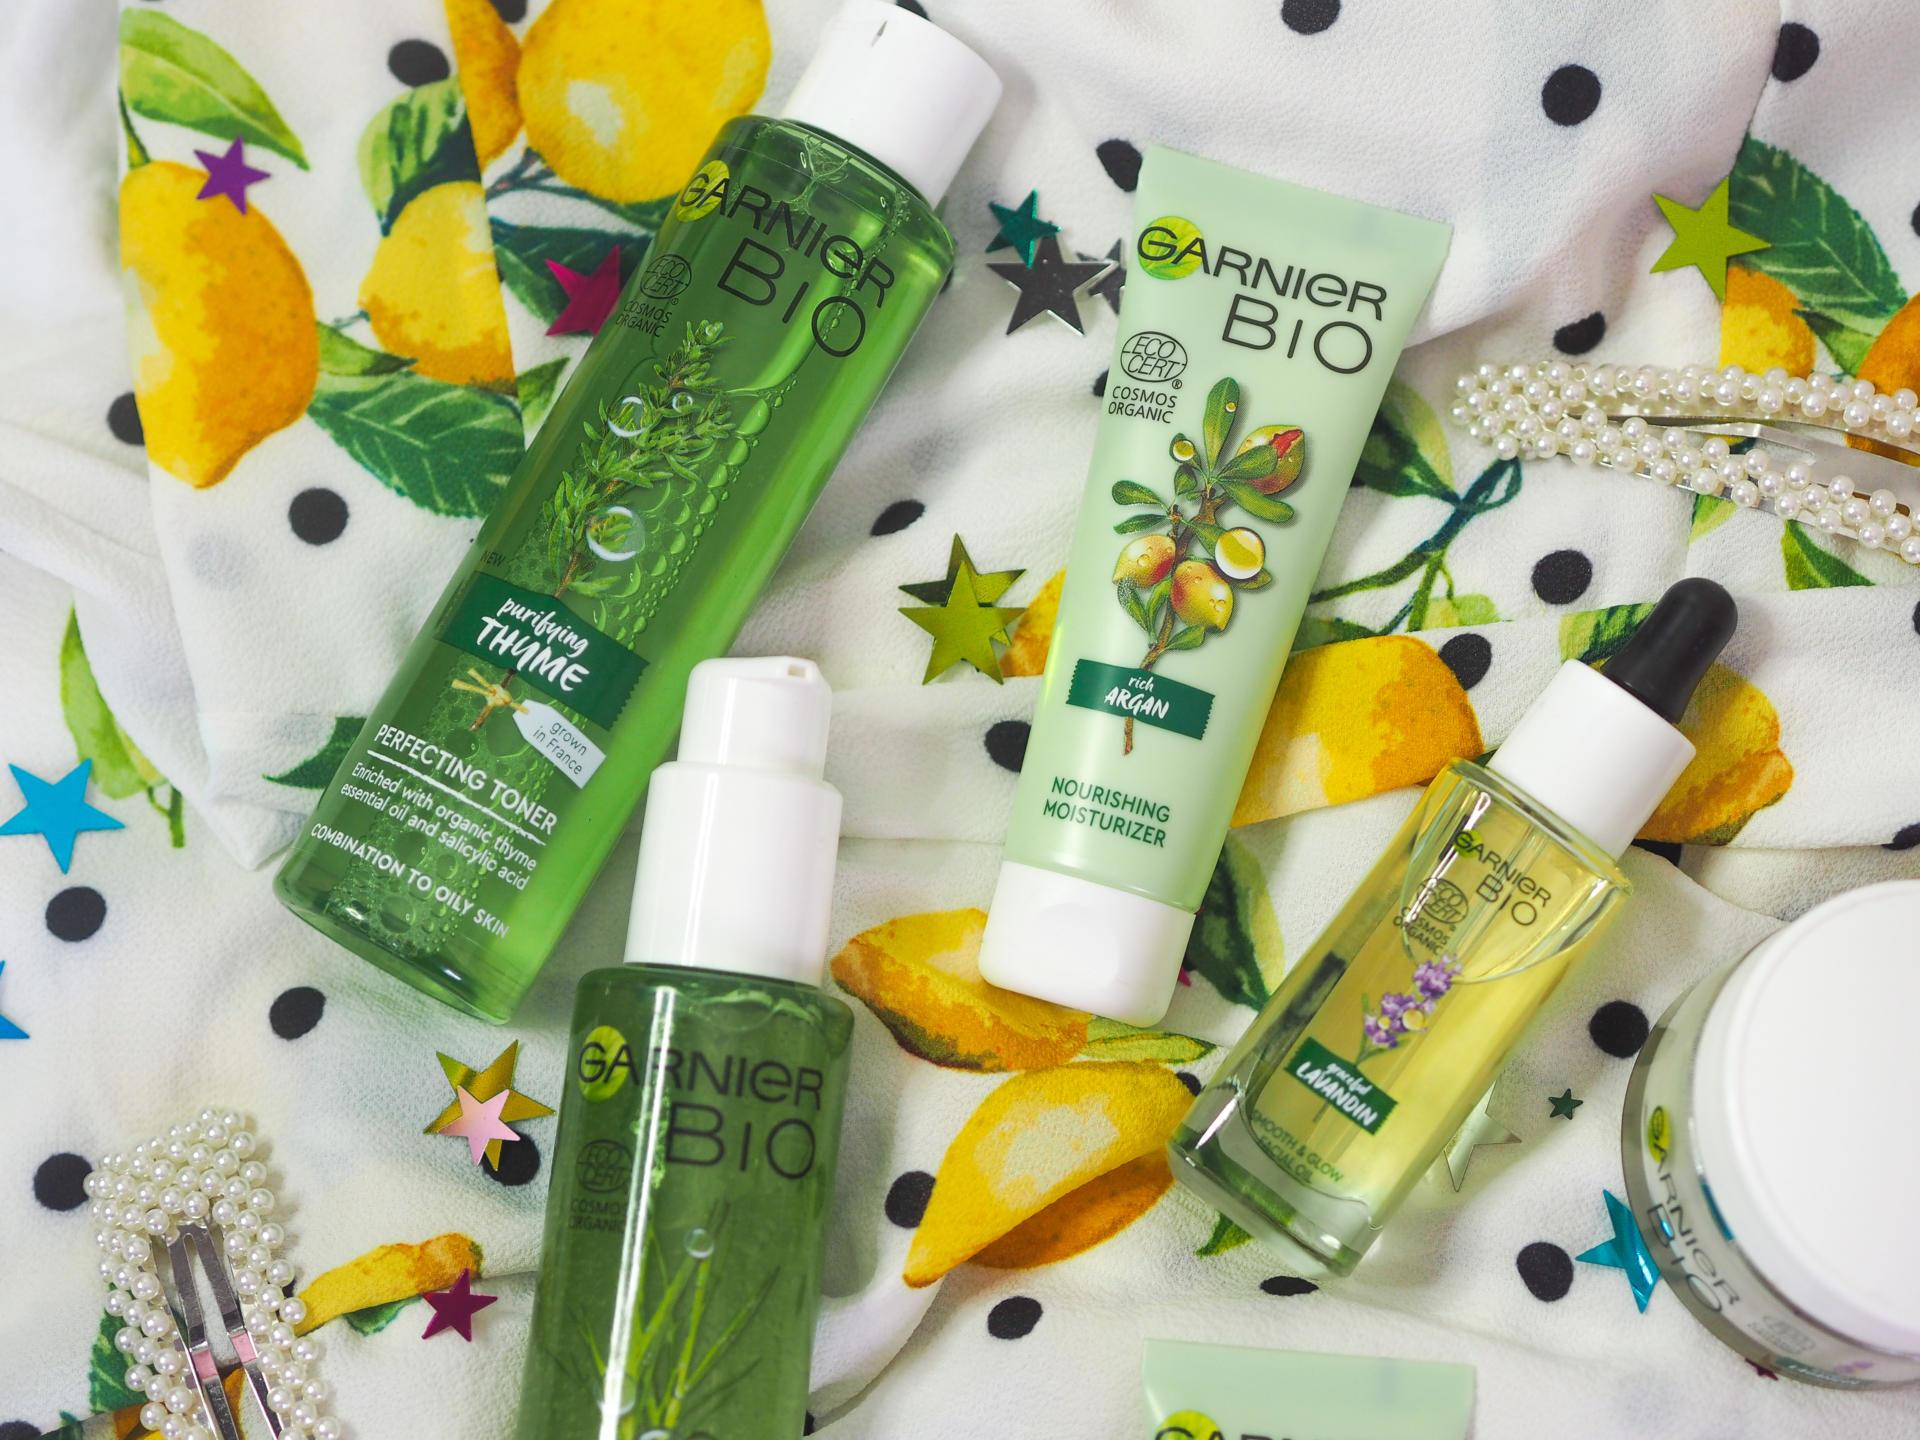 A First Look at the NEW Garnier Bio Organic Skincare Range - Rachel Nicole UK Blogger